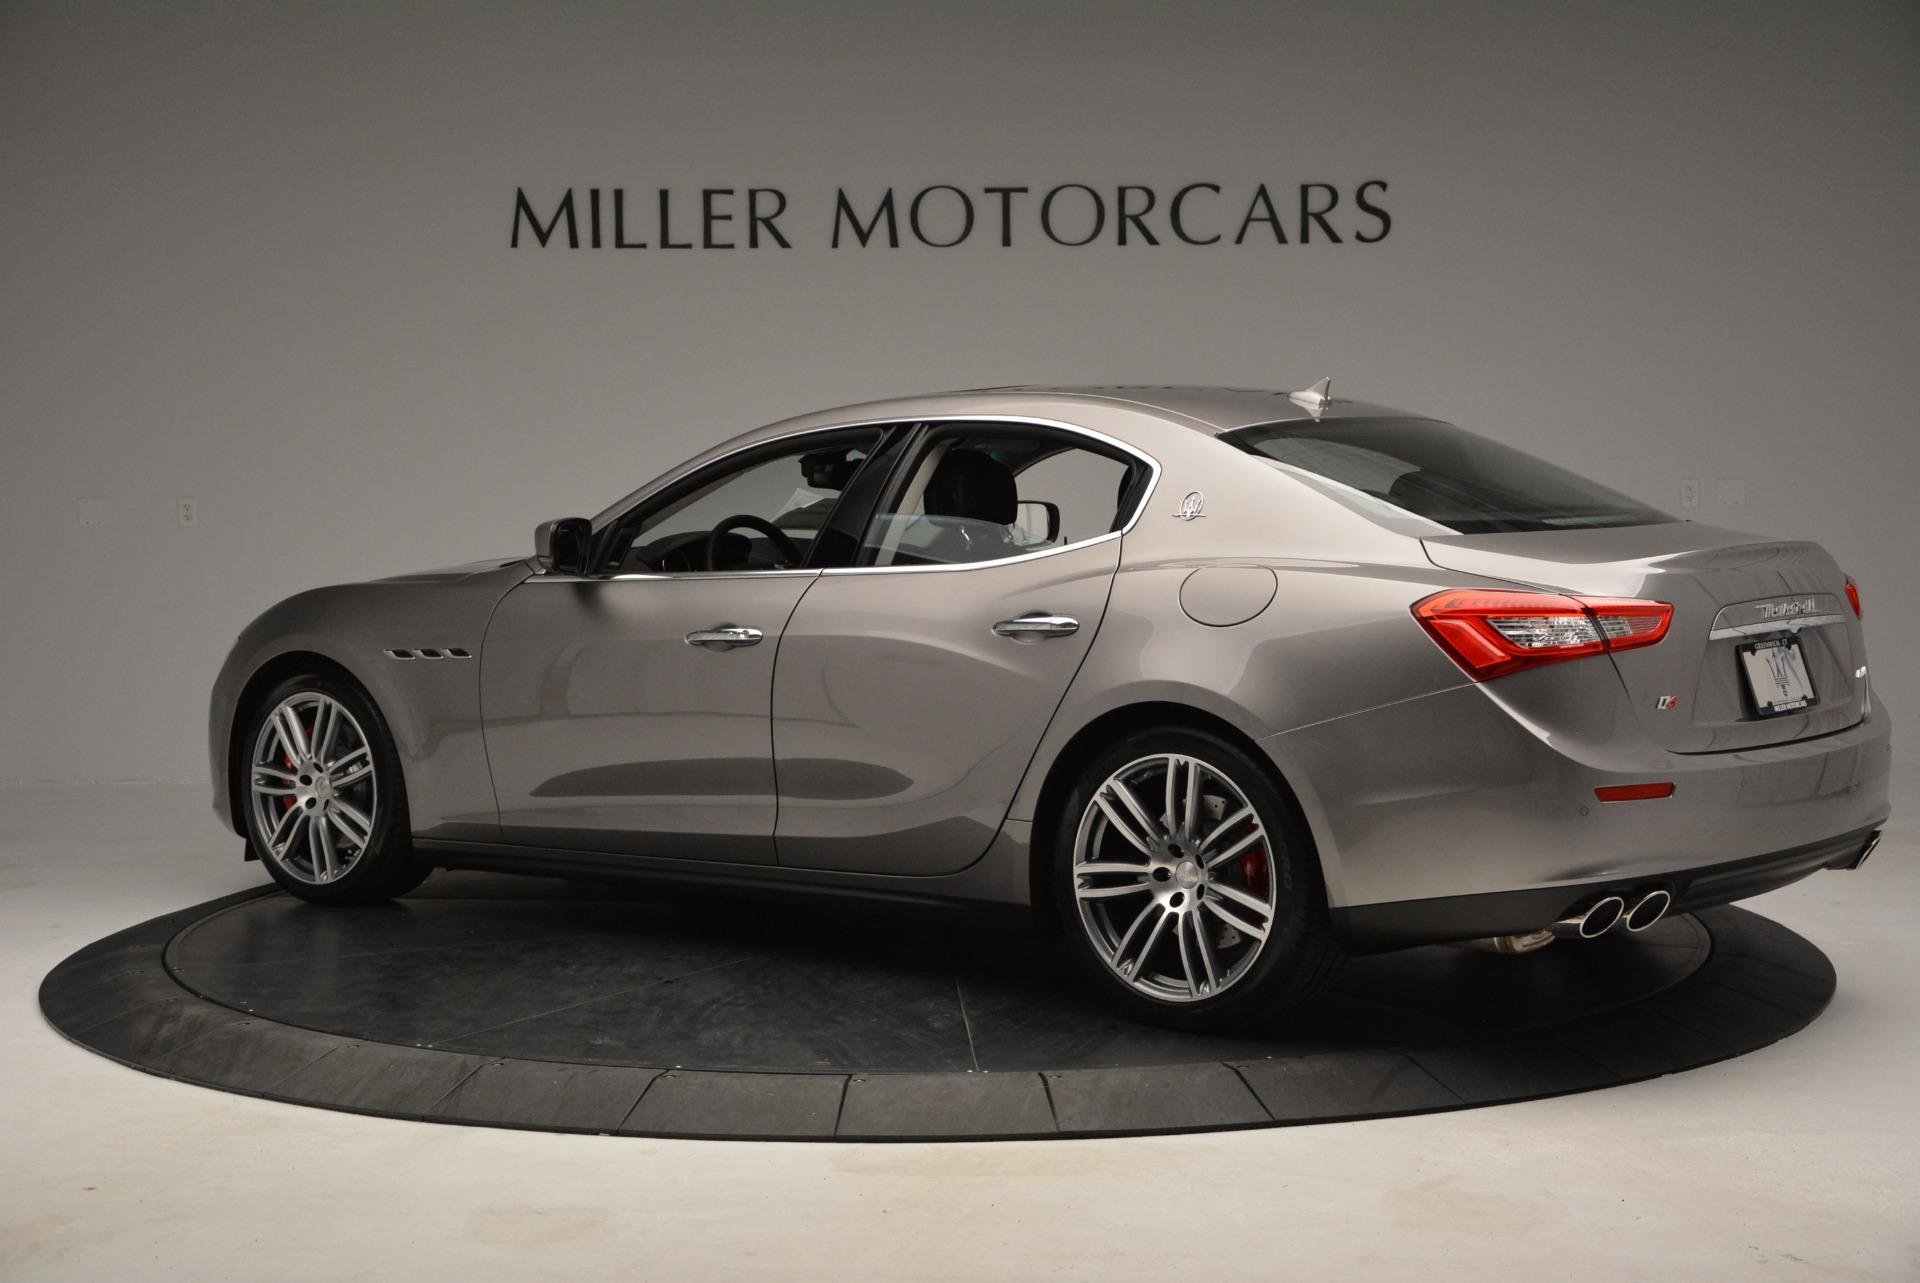 Used 2014 Maserati Ghibli S Q4 For Sale In Greenwich, CT. Alfa Romeo of Greenwich, 7426 2562_p4